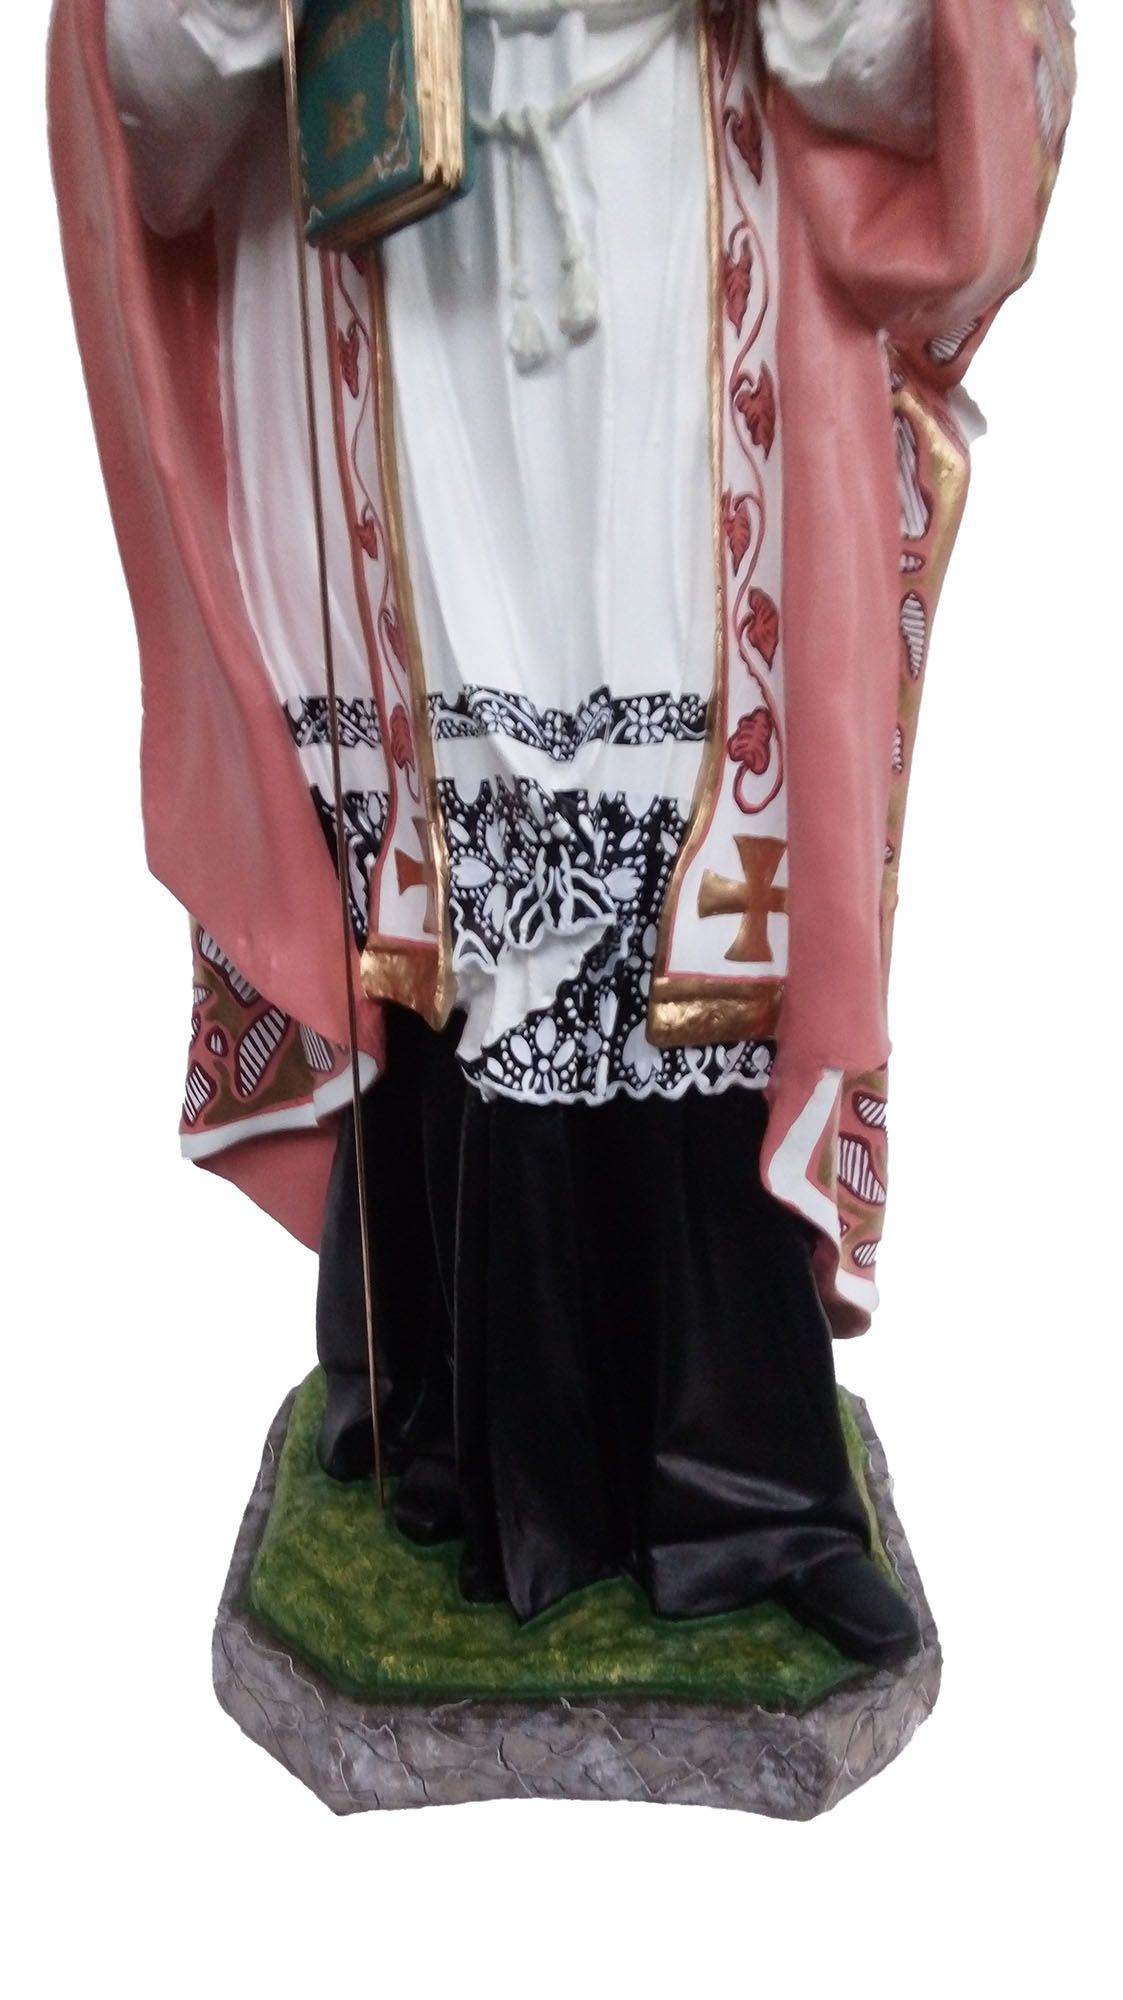 Santo Agostinho - 90 cm